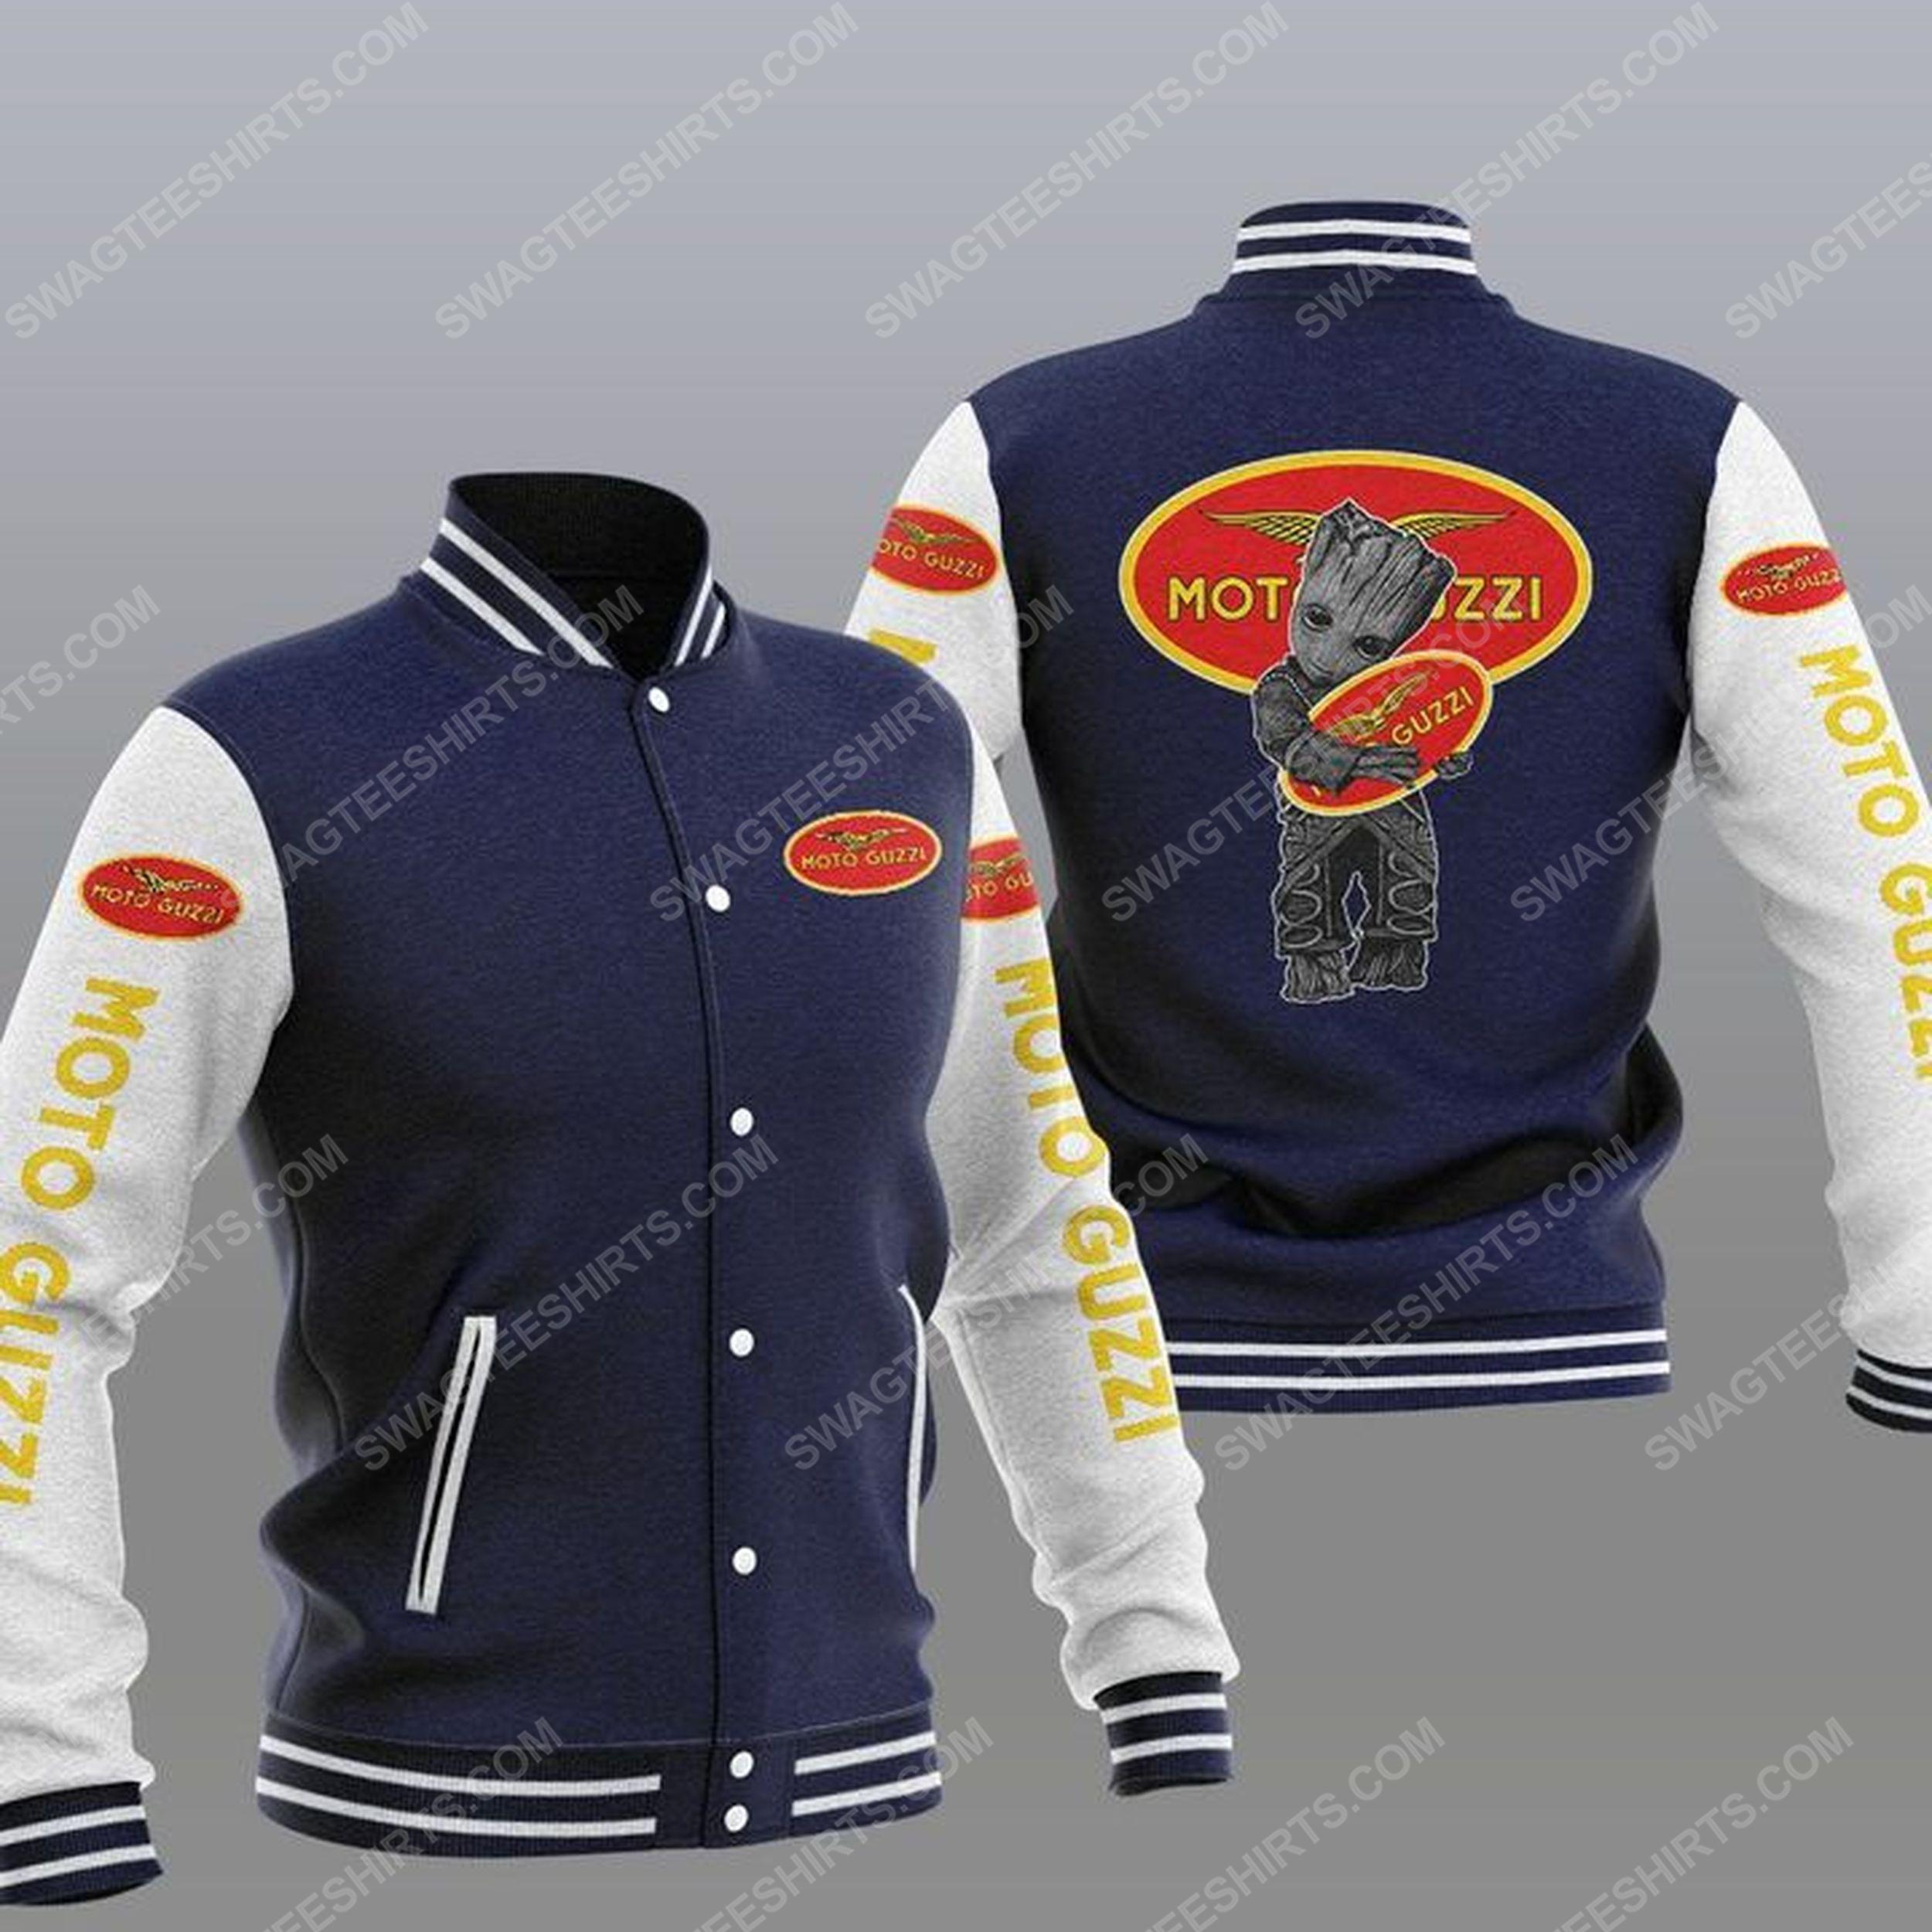 Baby groot and moto guzzi all over print baseball jacket -navy 1